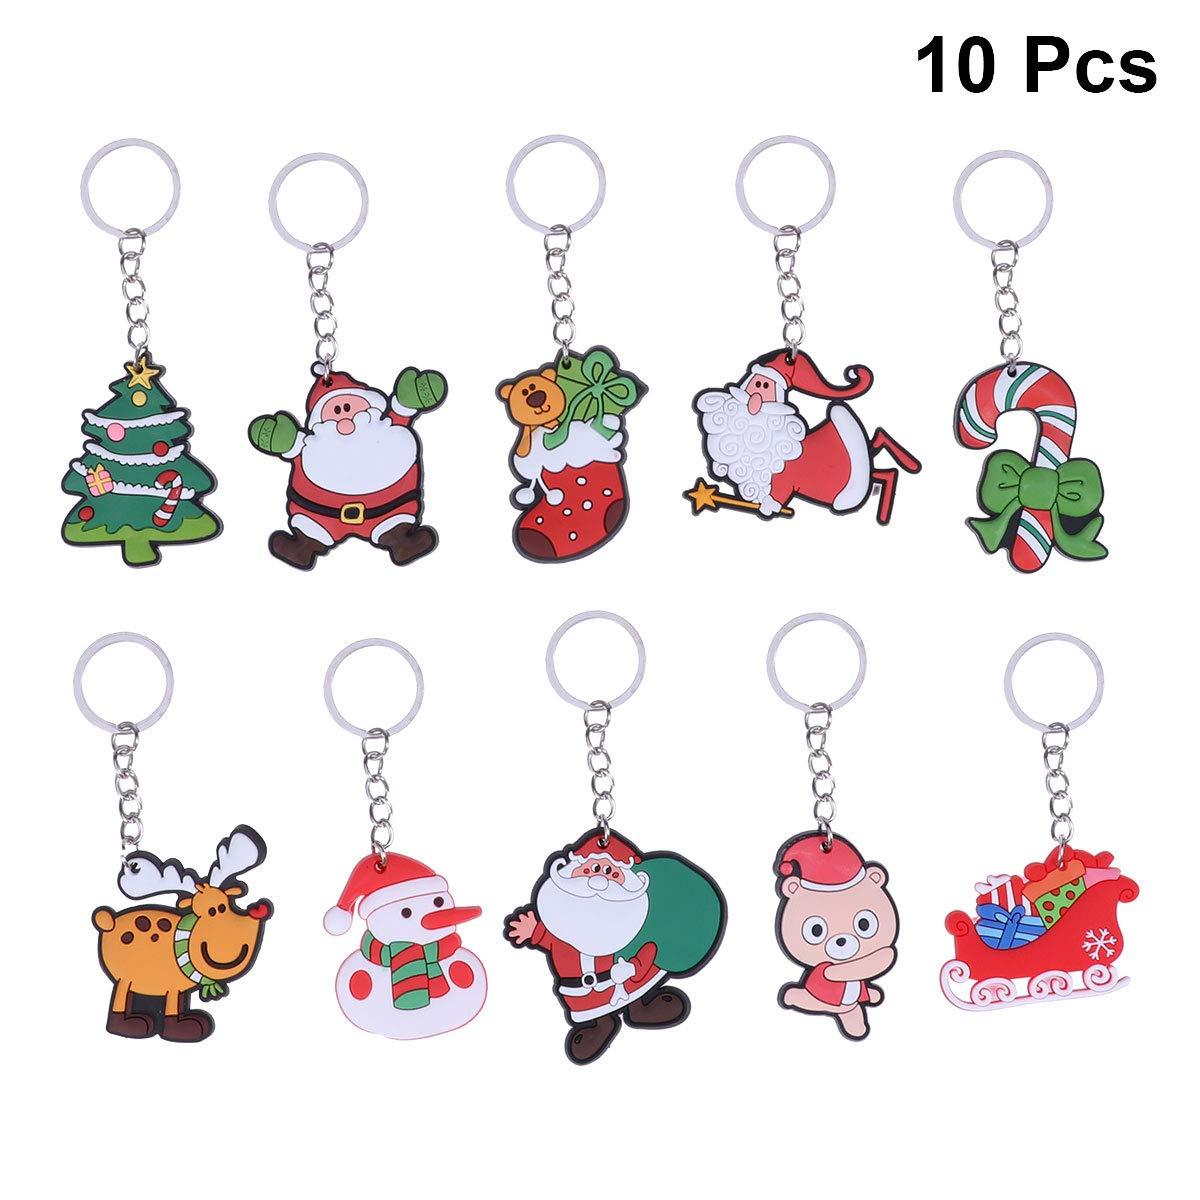 Amosfun 10pcs Keyring Keychain Christmas Car Keyring Purse Bag Pendant Decoration Christmas Birthday Gift for Friends